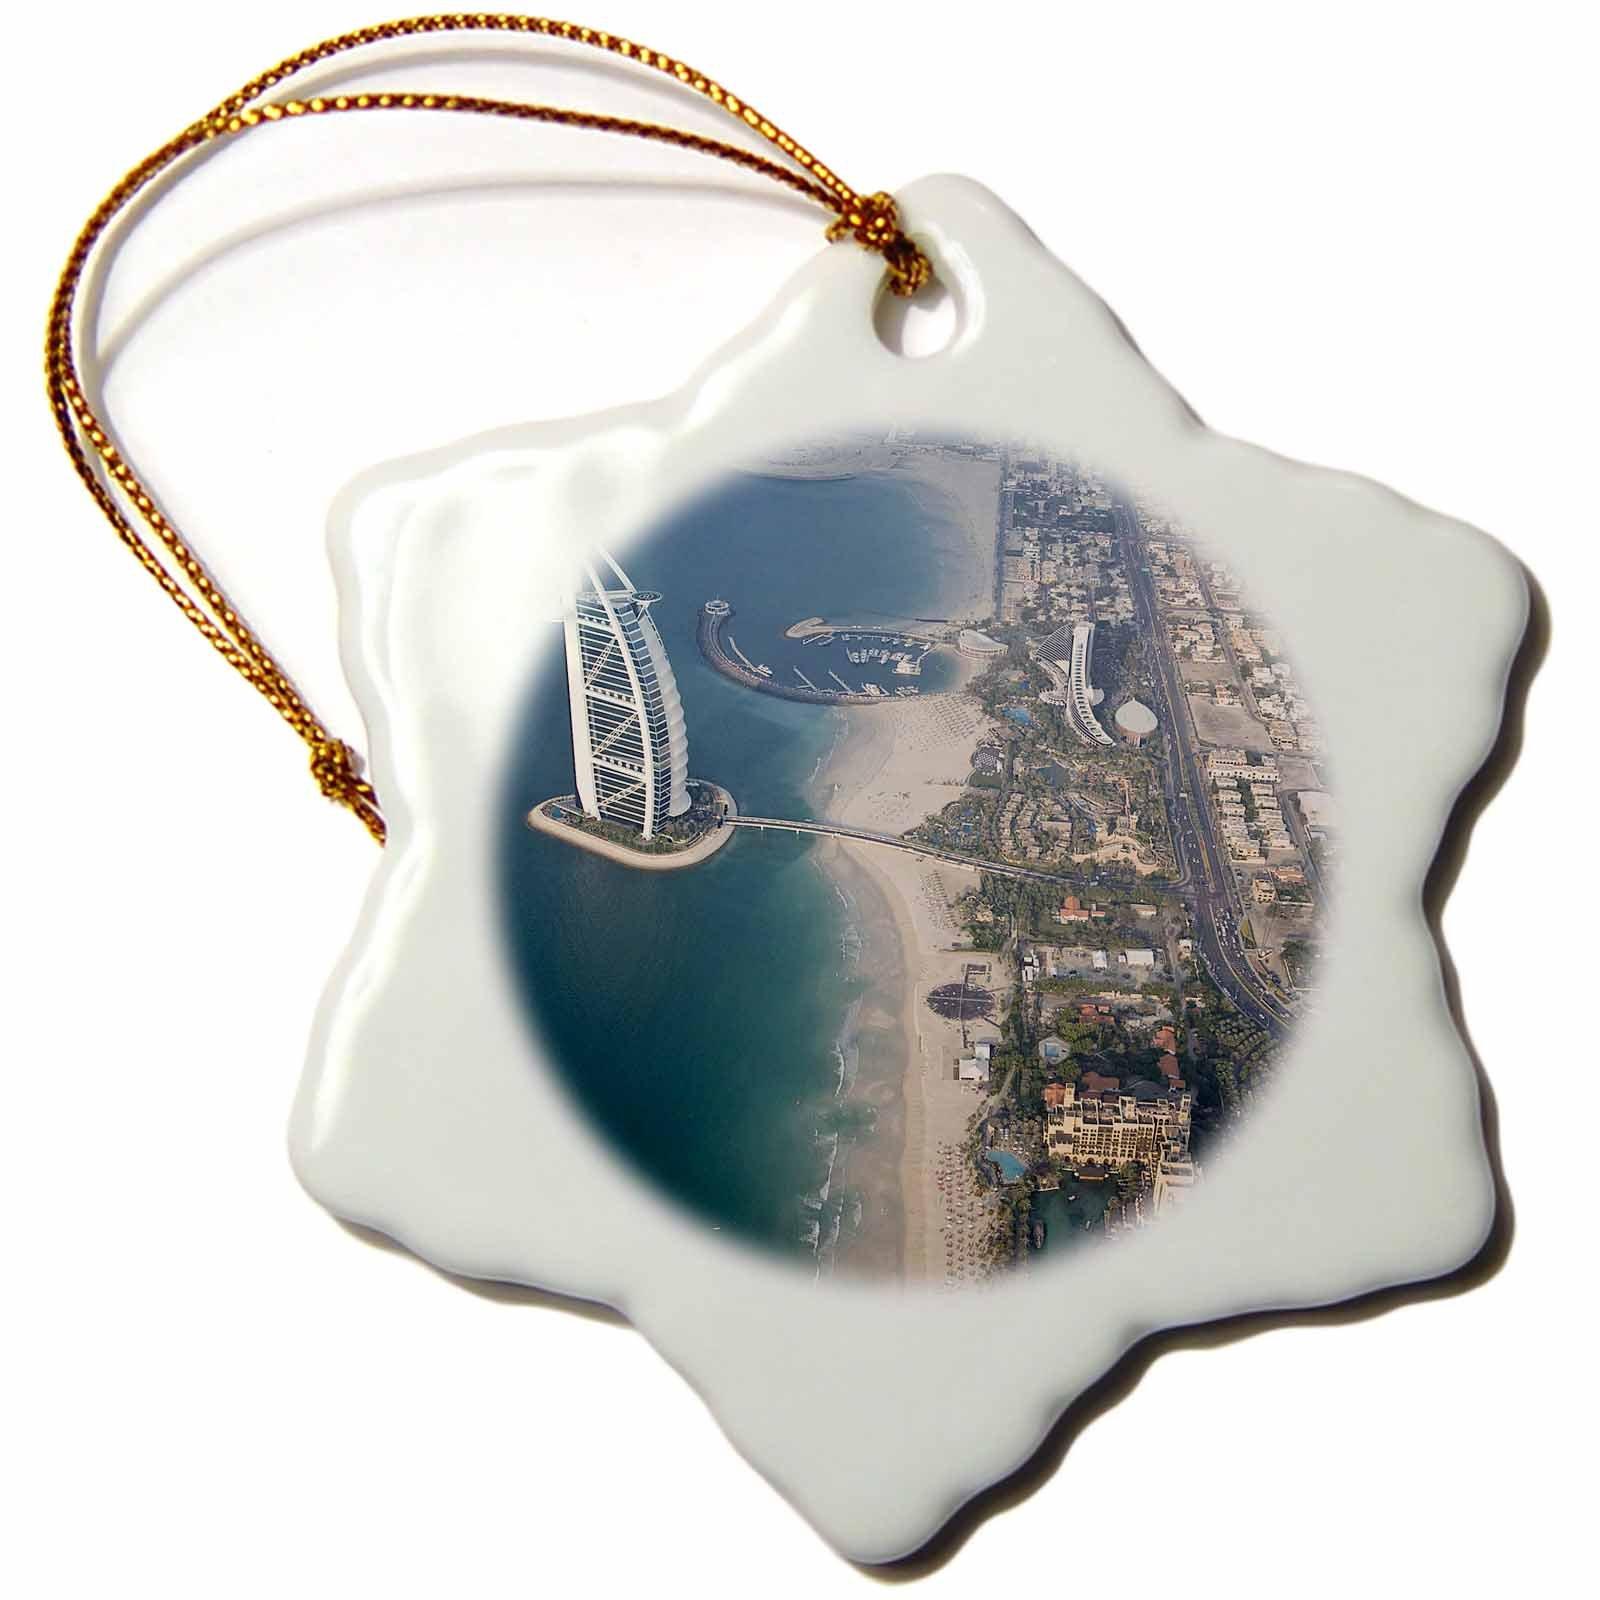 3dRose orn_71585_1 UAE, Dubai, Burj al Arab Hotel and Neighborhood AS44 BJA0140 Janyes Gallery Snowflake Porcelain Ornament, 3-Inch